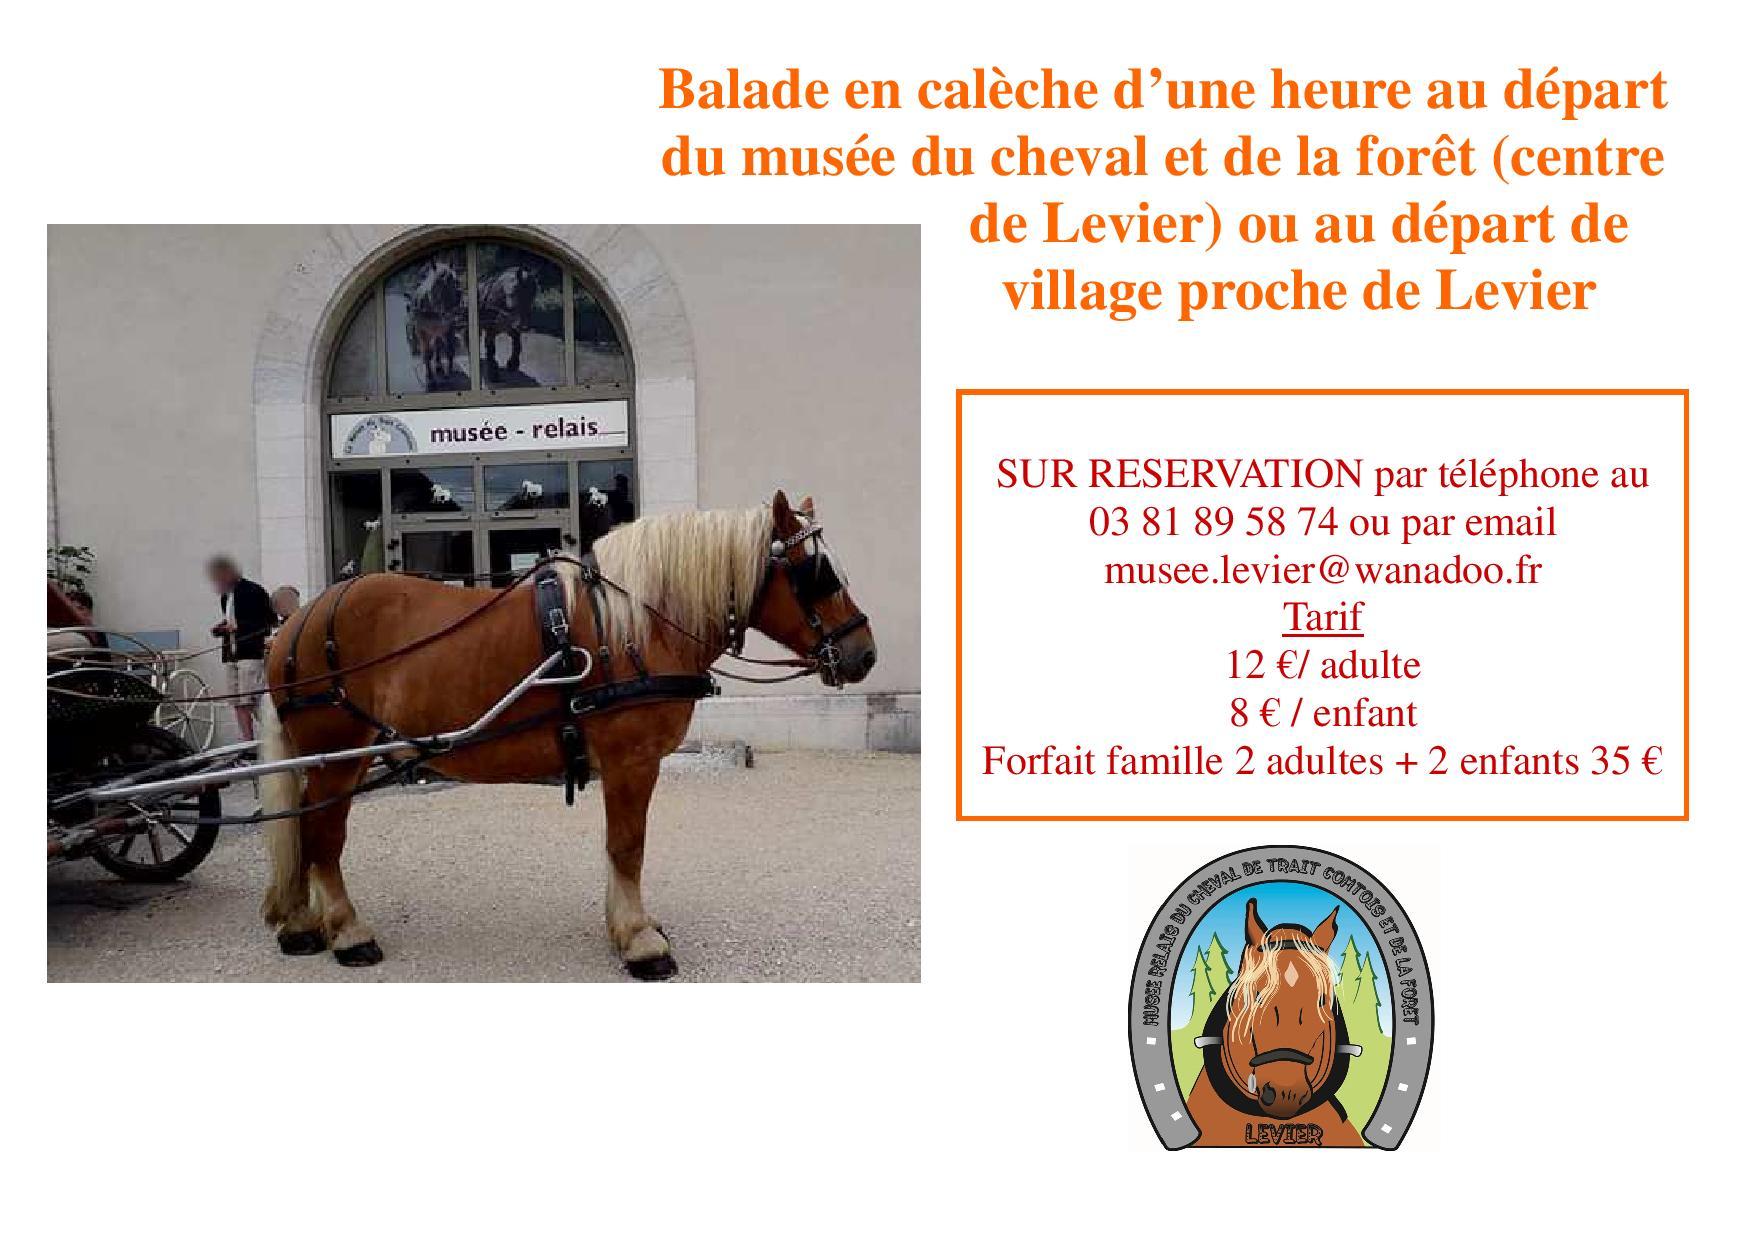 promenade calèche-page-001.jpg